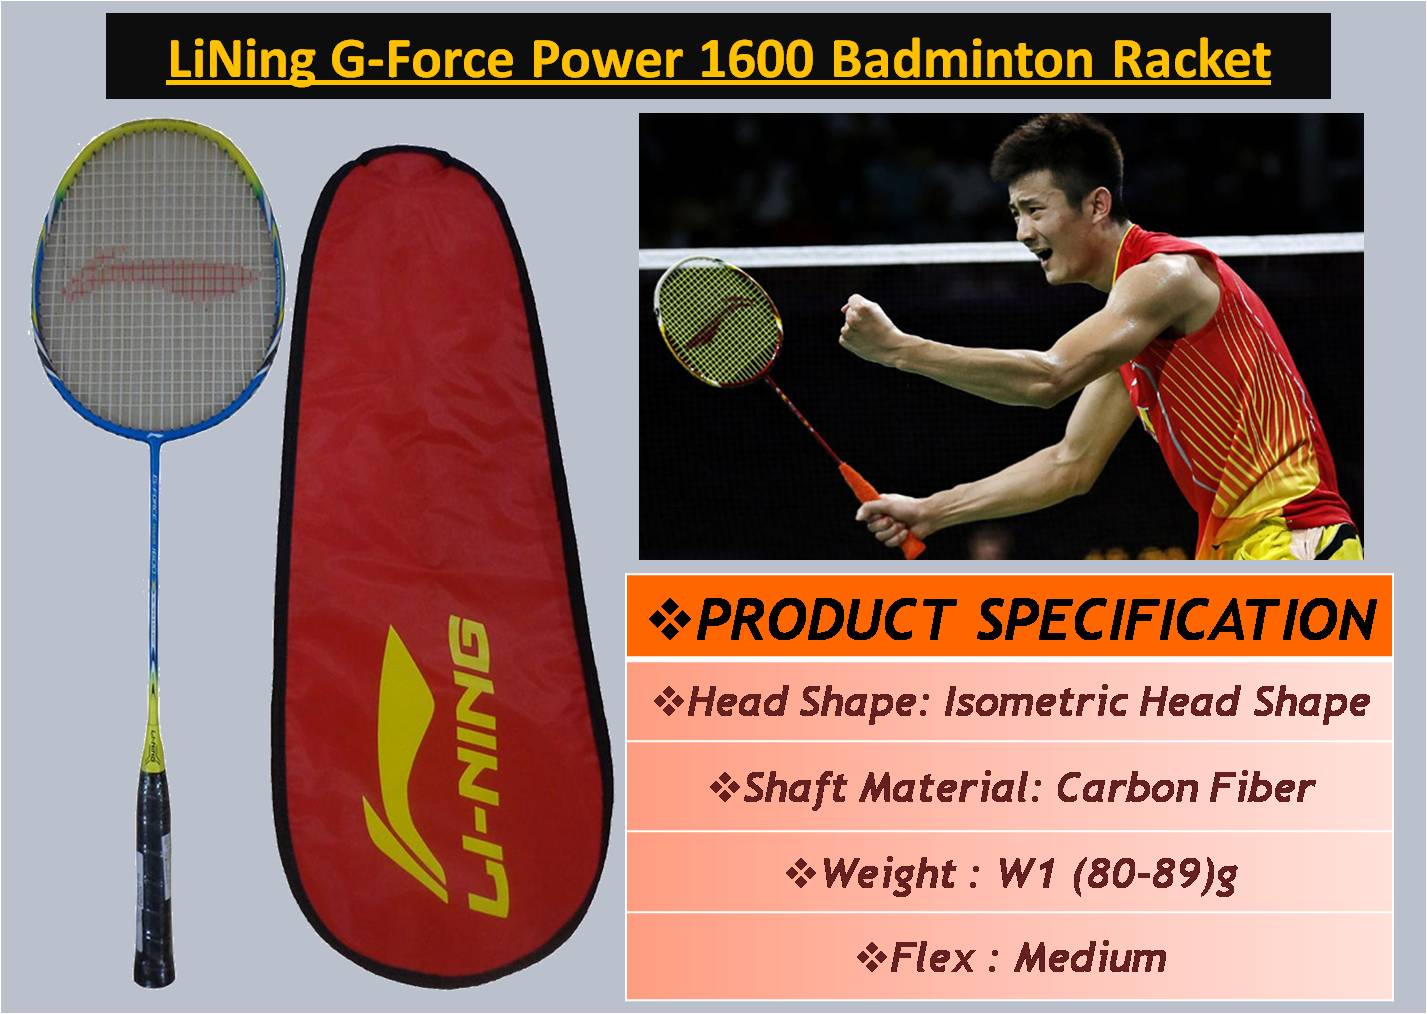 LiNing G-Force Power 1600 Badminton Racket